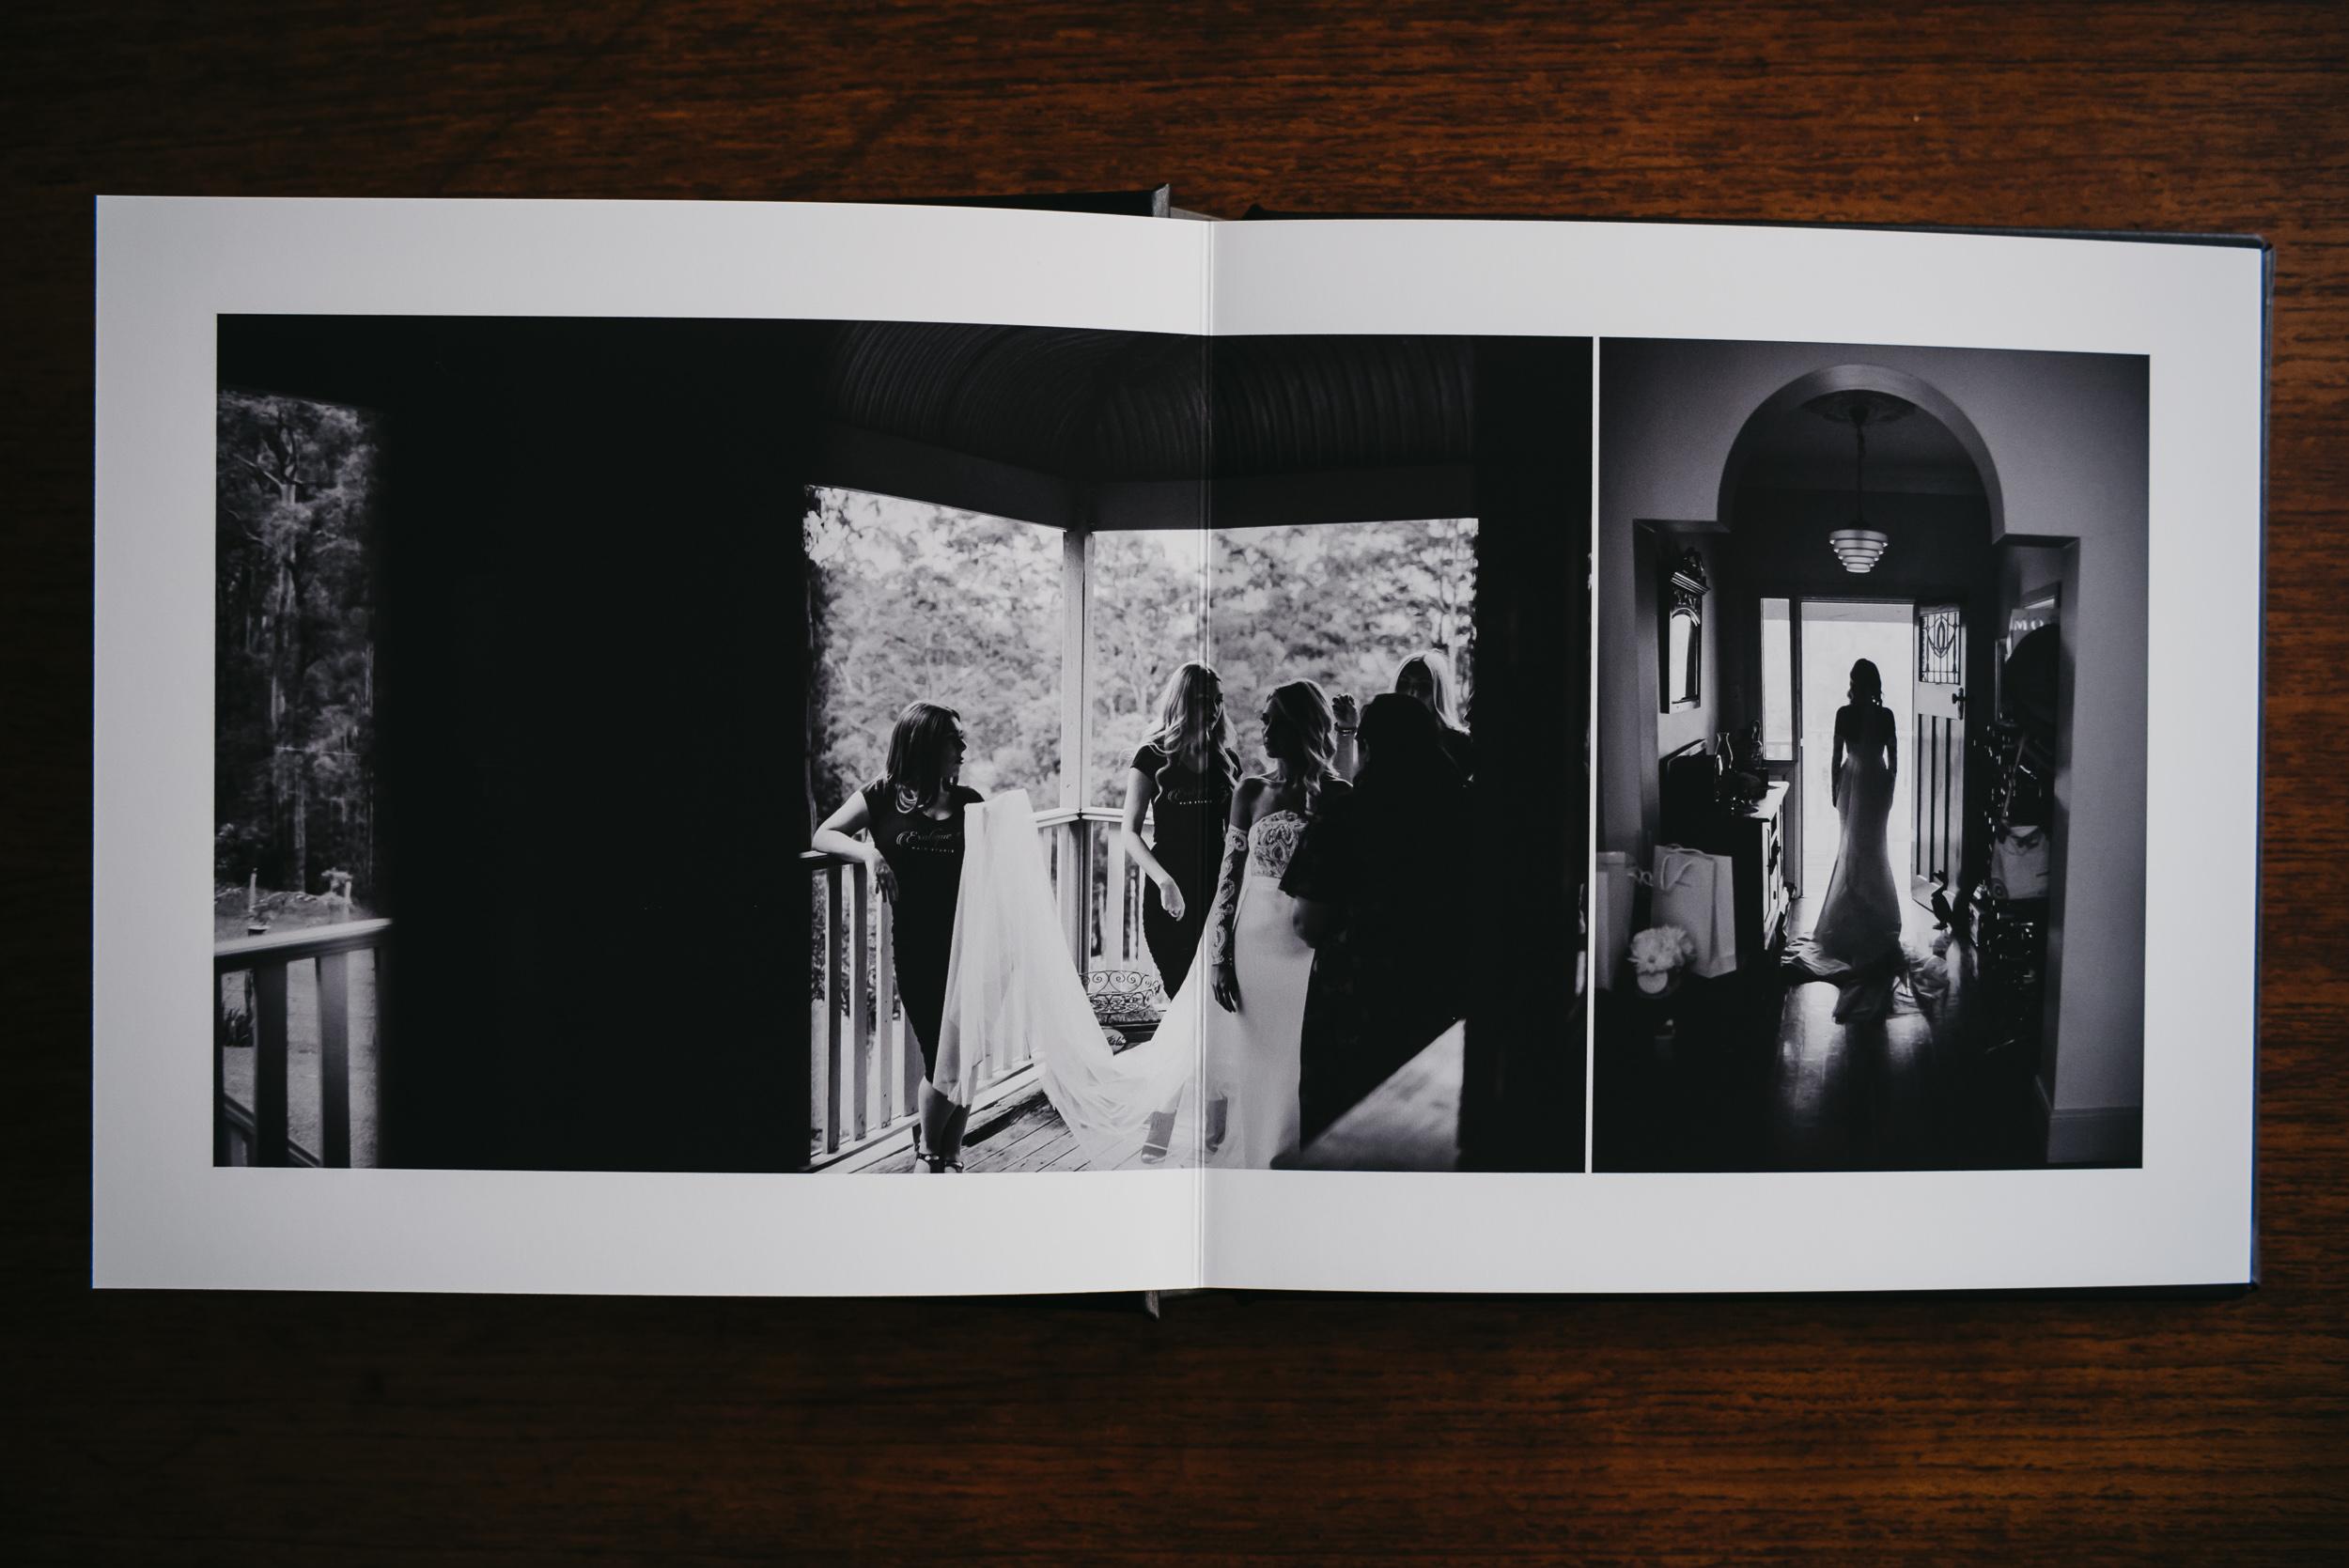 Fine_art_wedding_album_jason_corroto-Photo (8 of 11).jpg